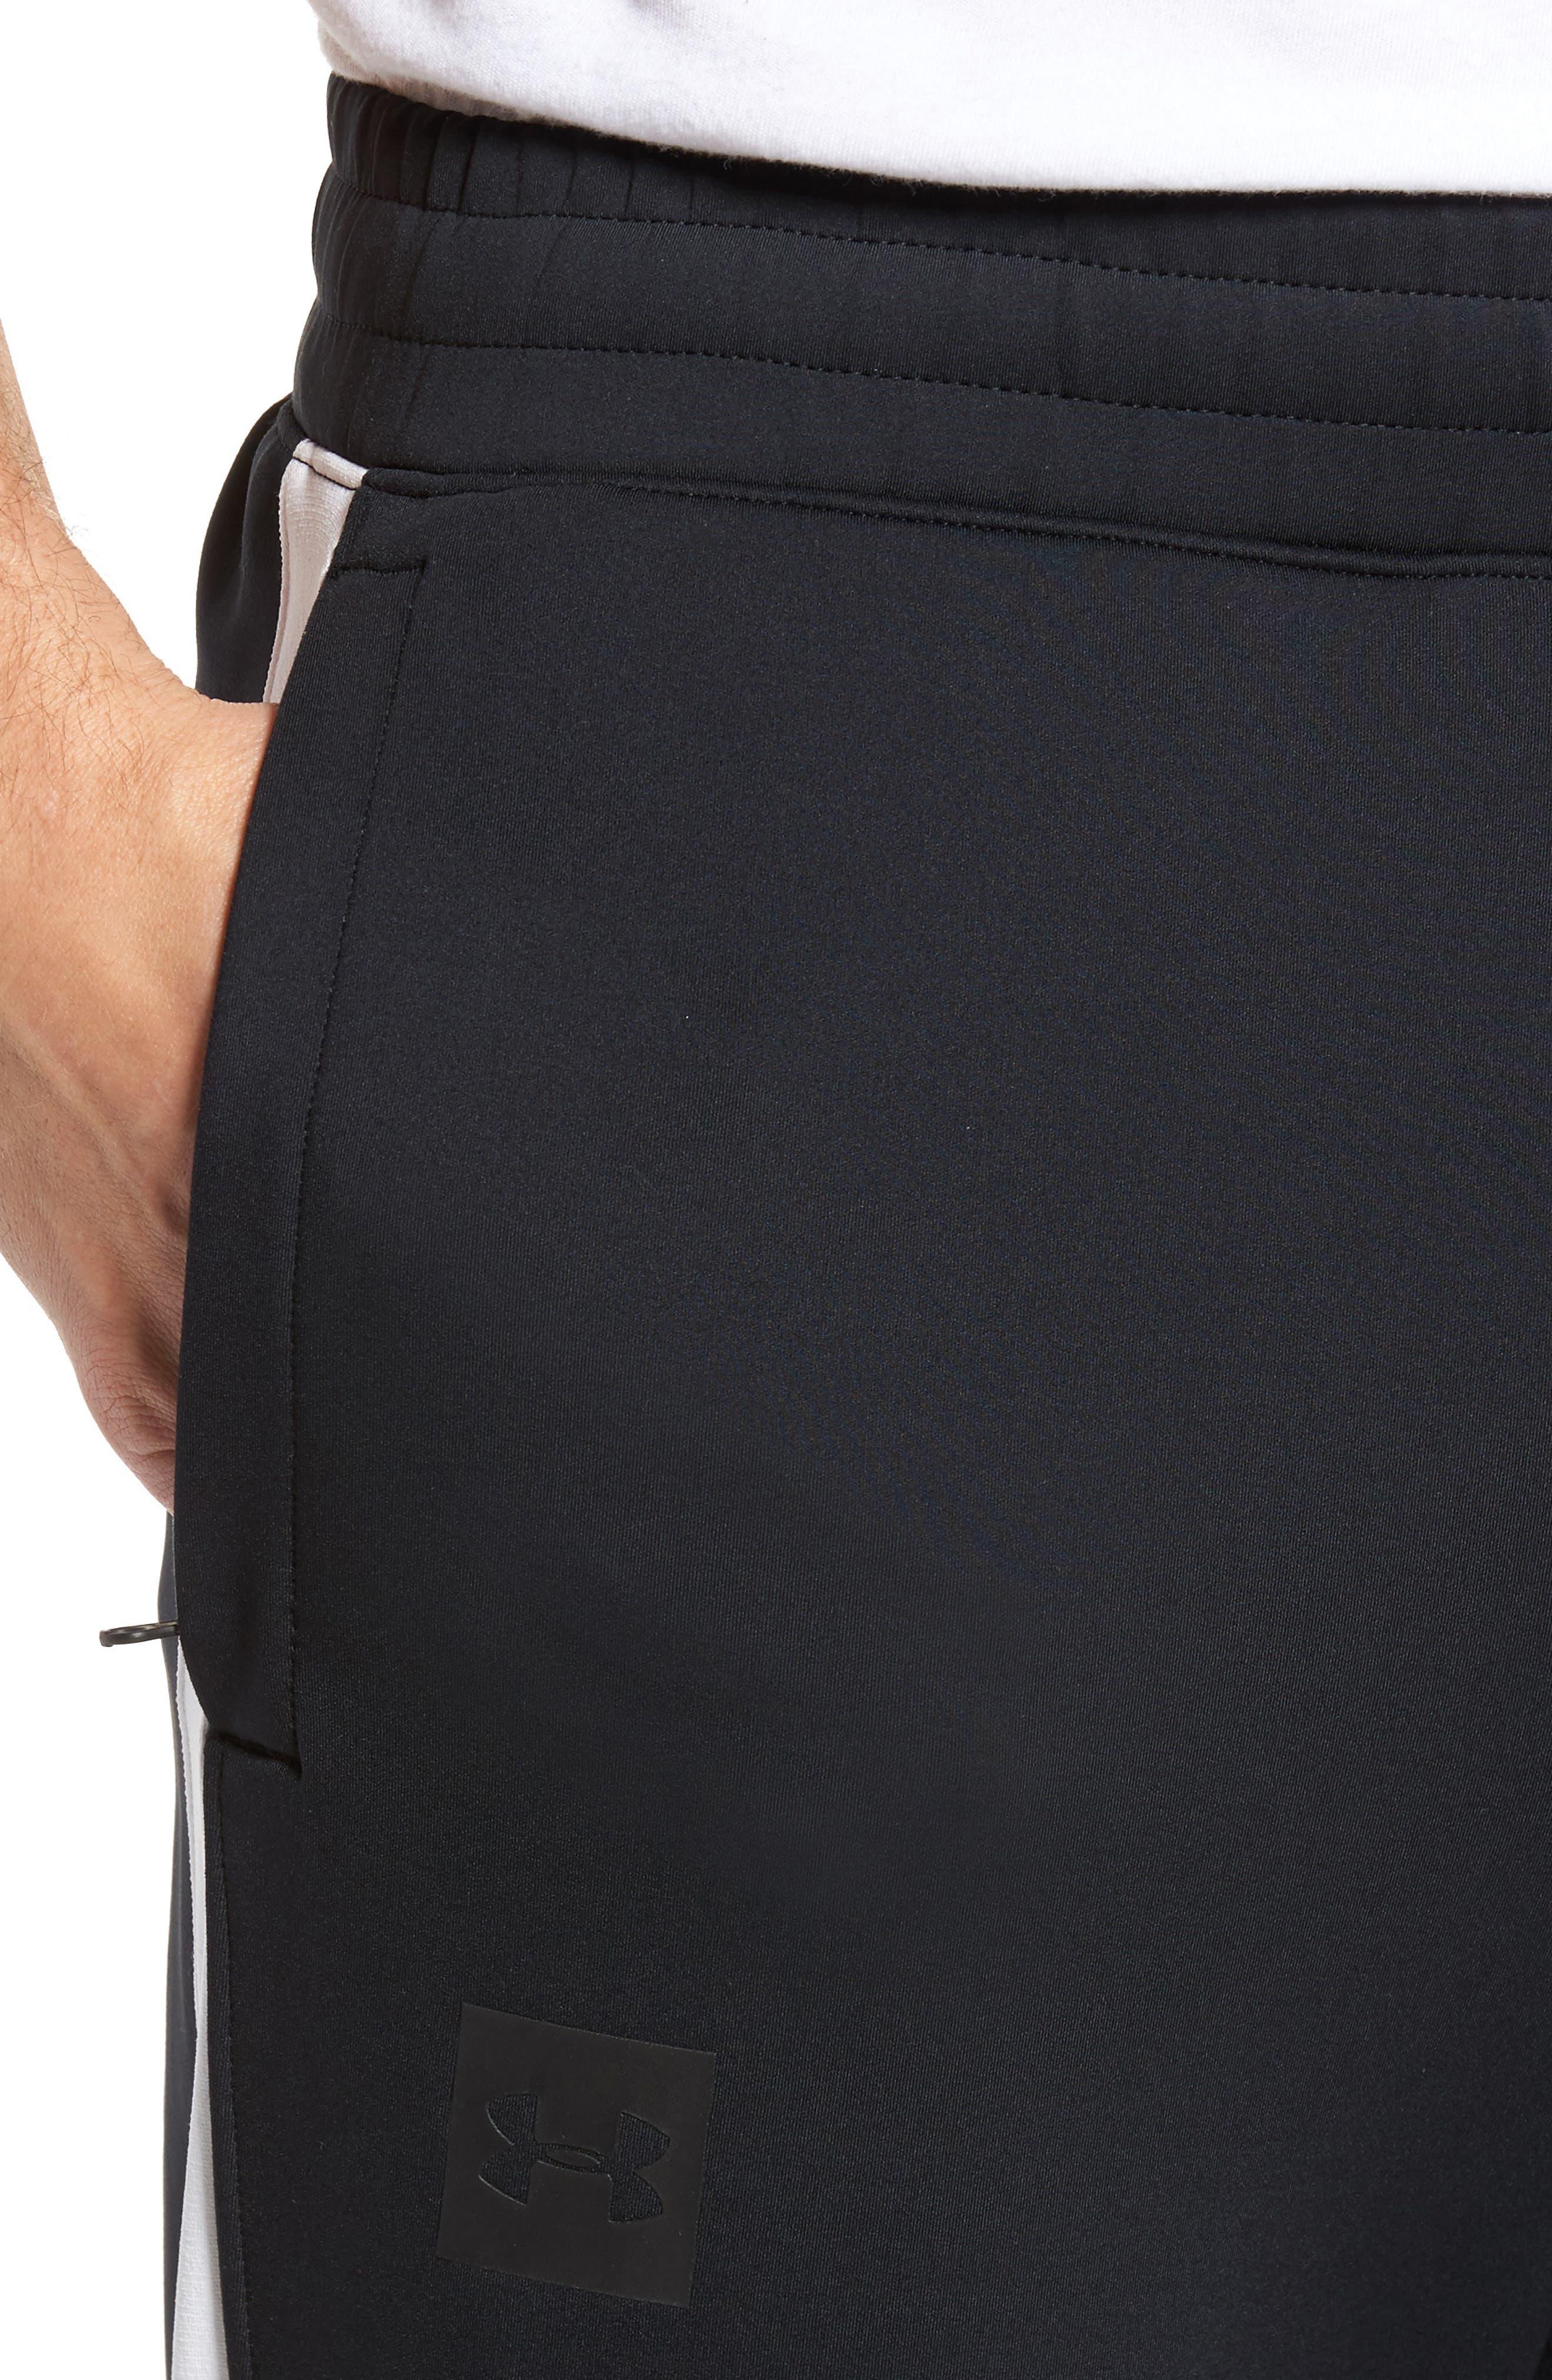 Sportstyle Track Pants,                             Alternate thumbnail 4, color,                             001